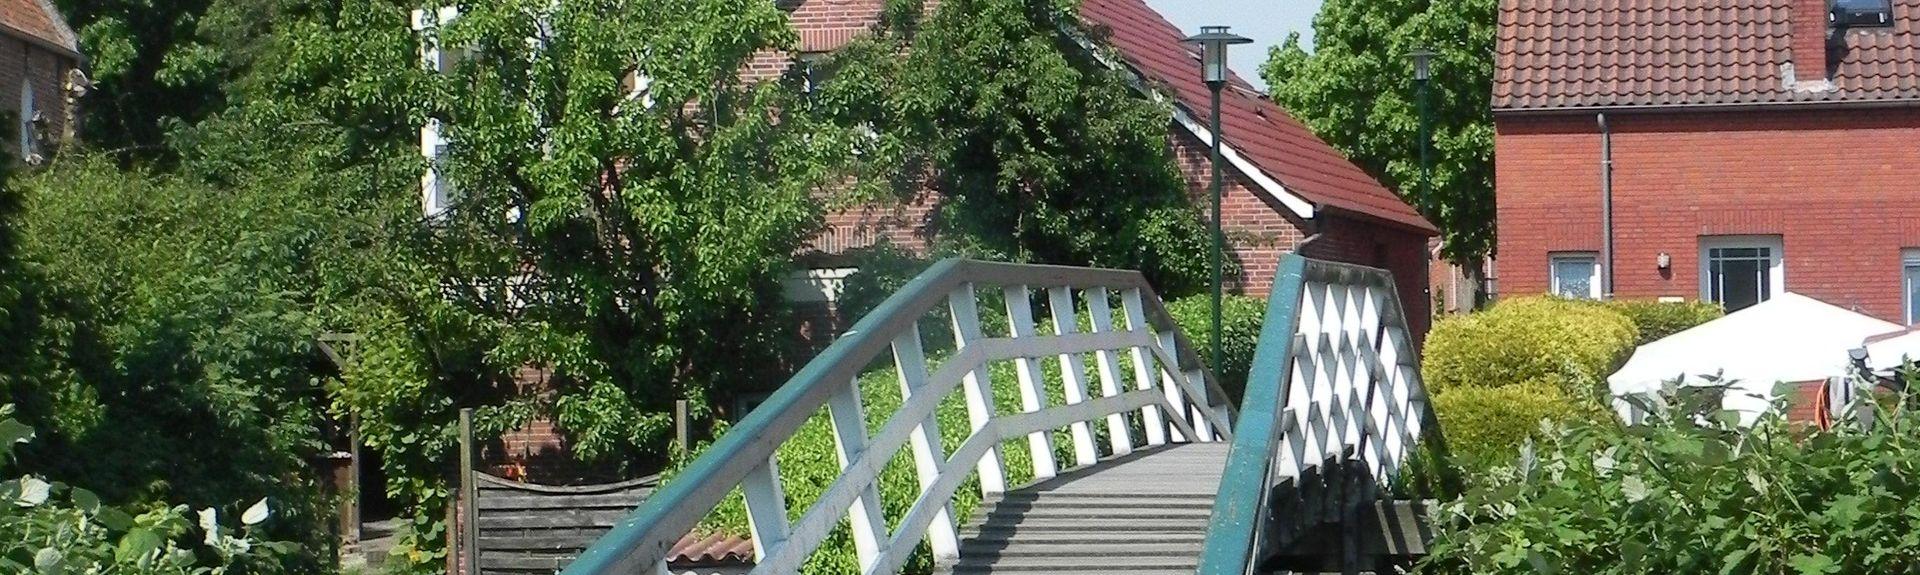 Leer, Lower Saxony, Germany